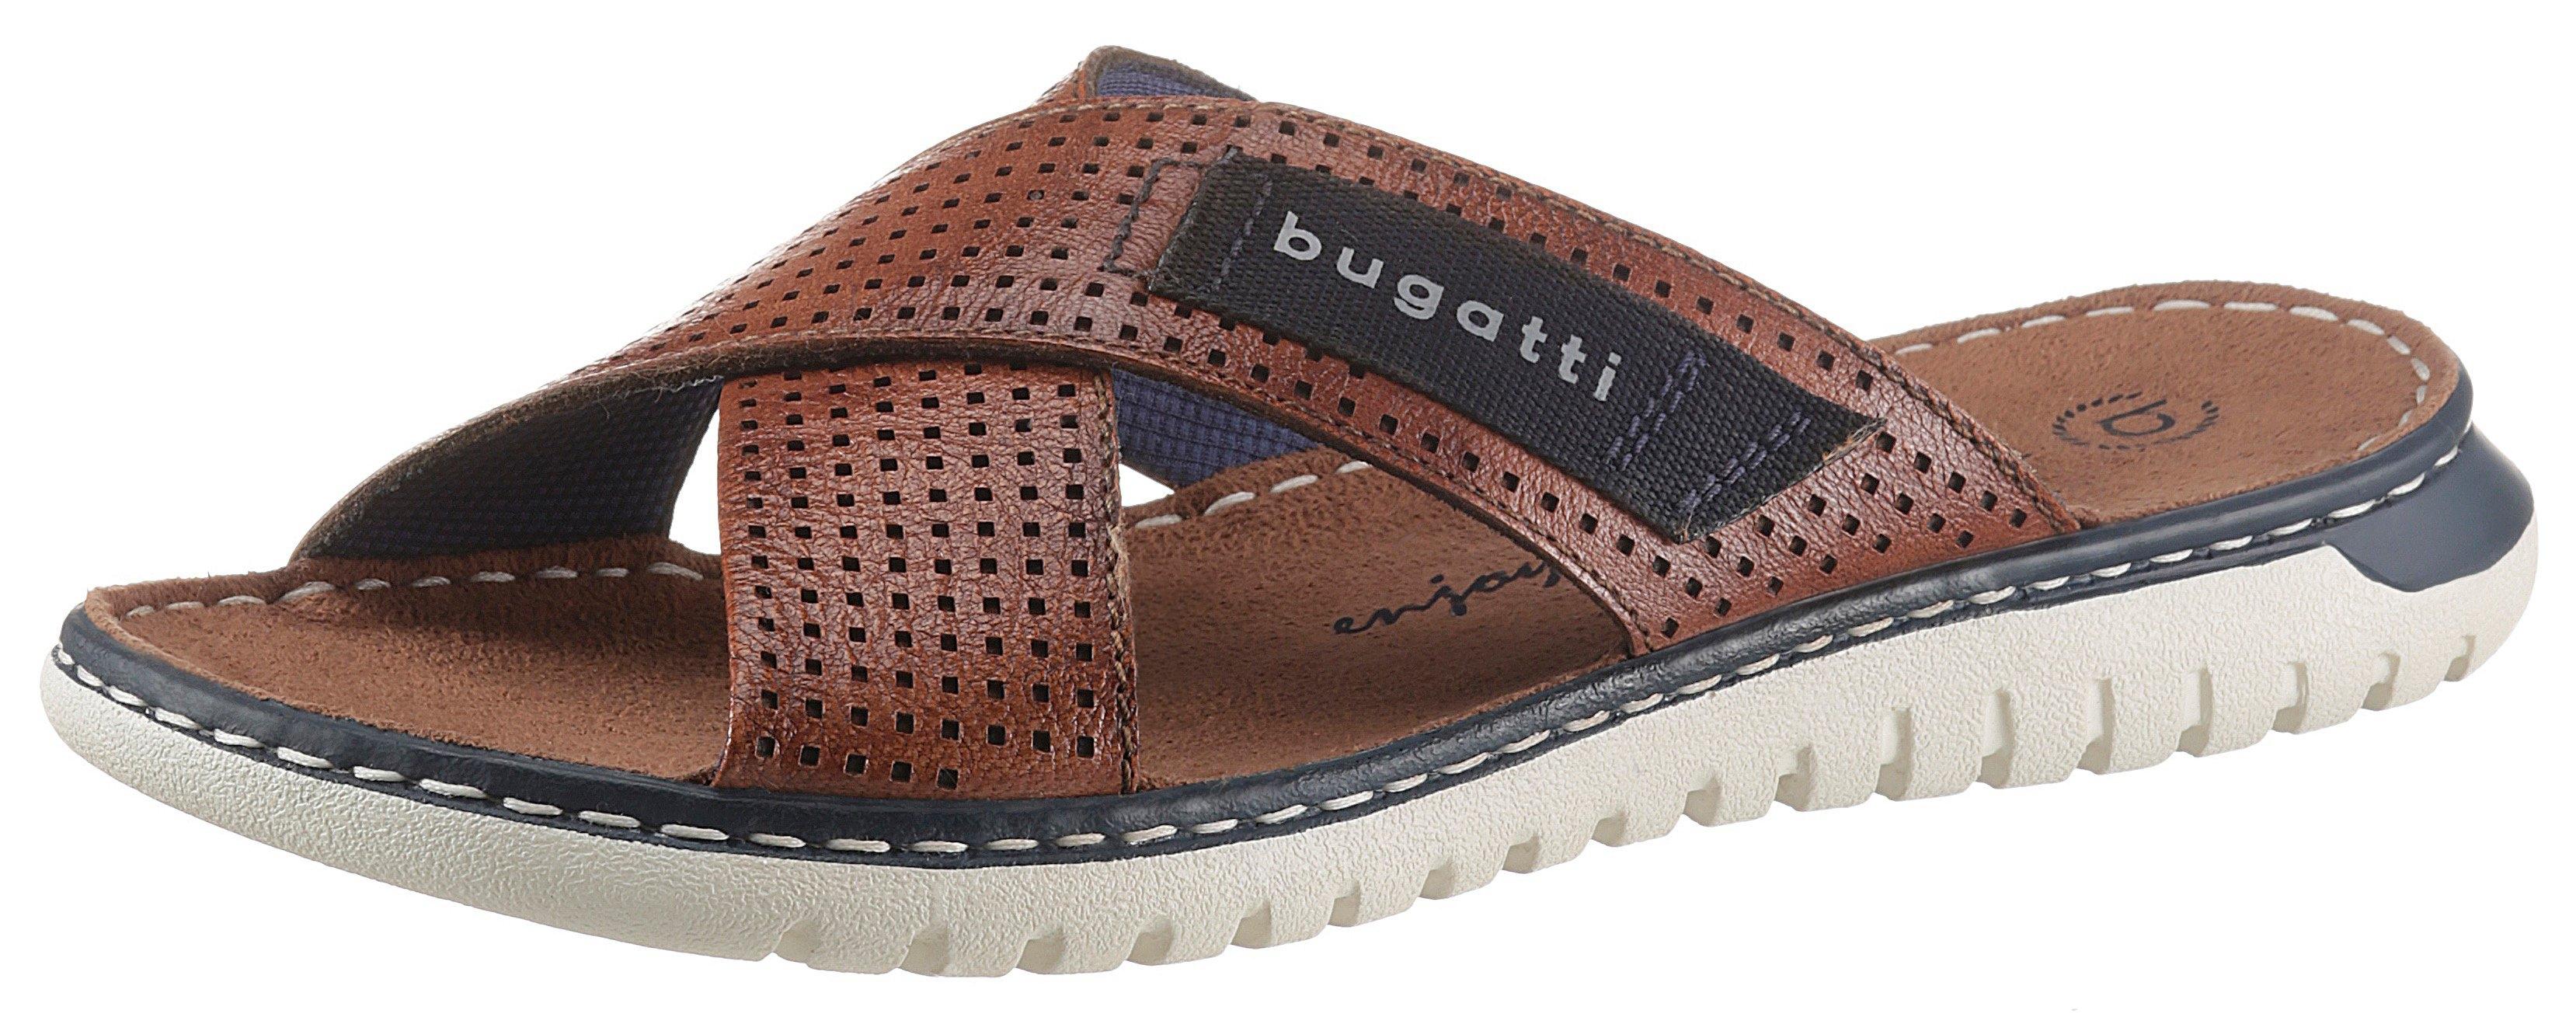 Bugatti slippers IDAHO met logo-garnering online kopen op otto.nl